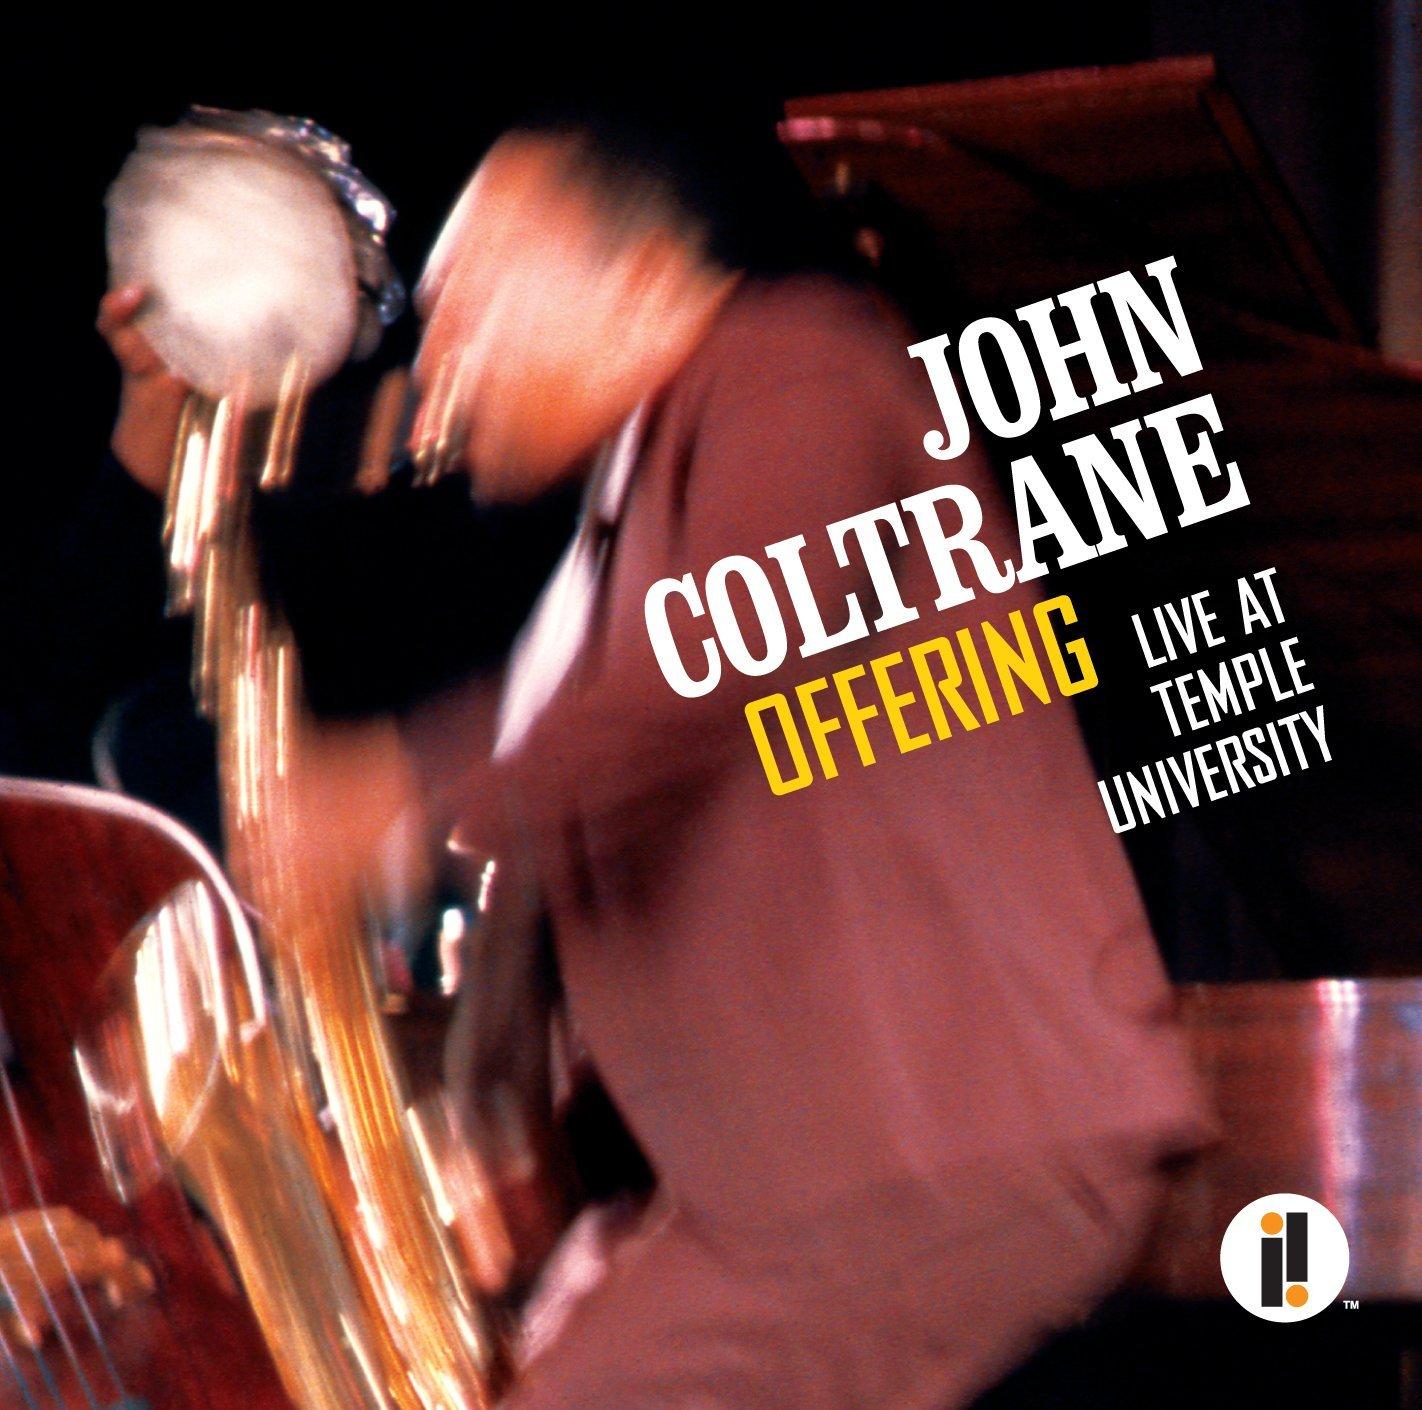 Offering: Live at Temple University - John Coltrane